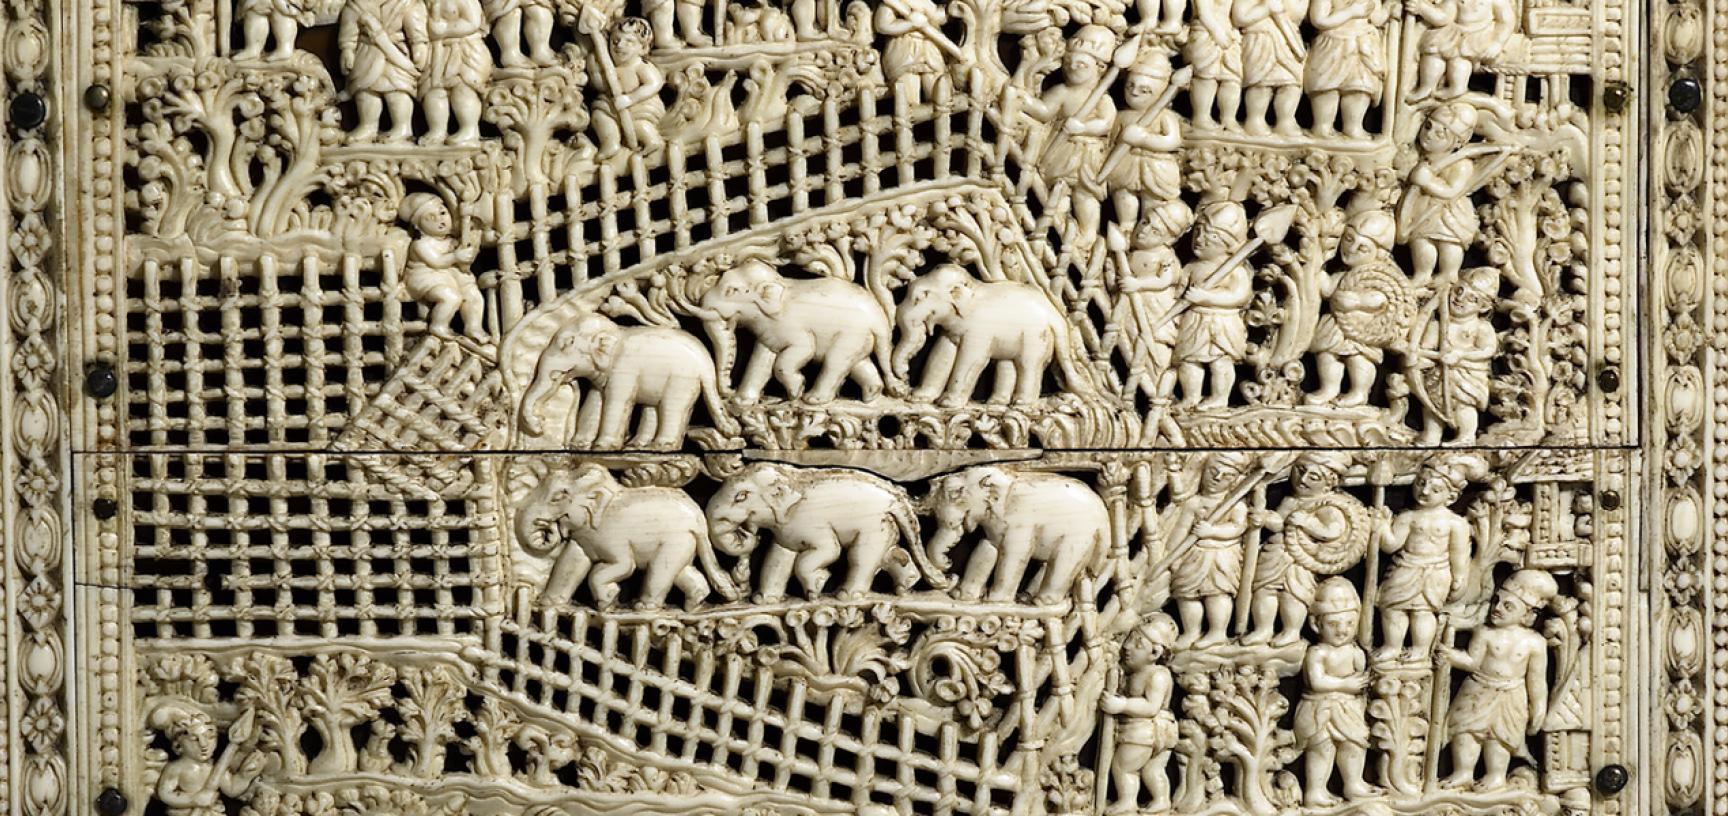 ashmolean mughal india